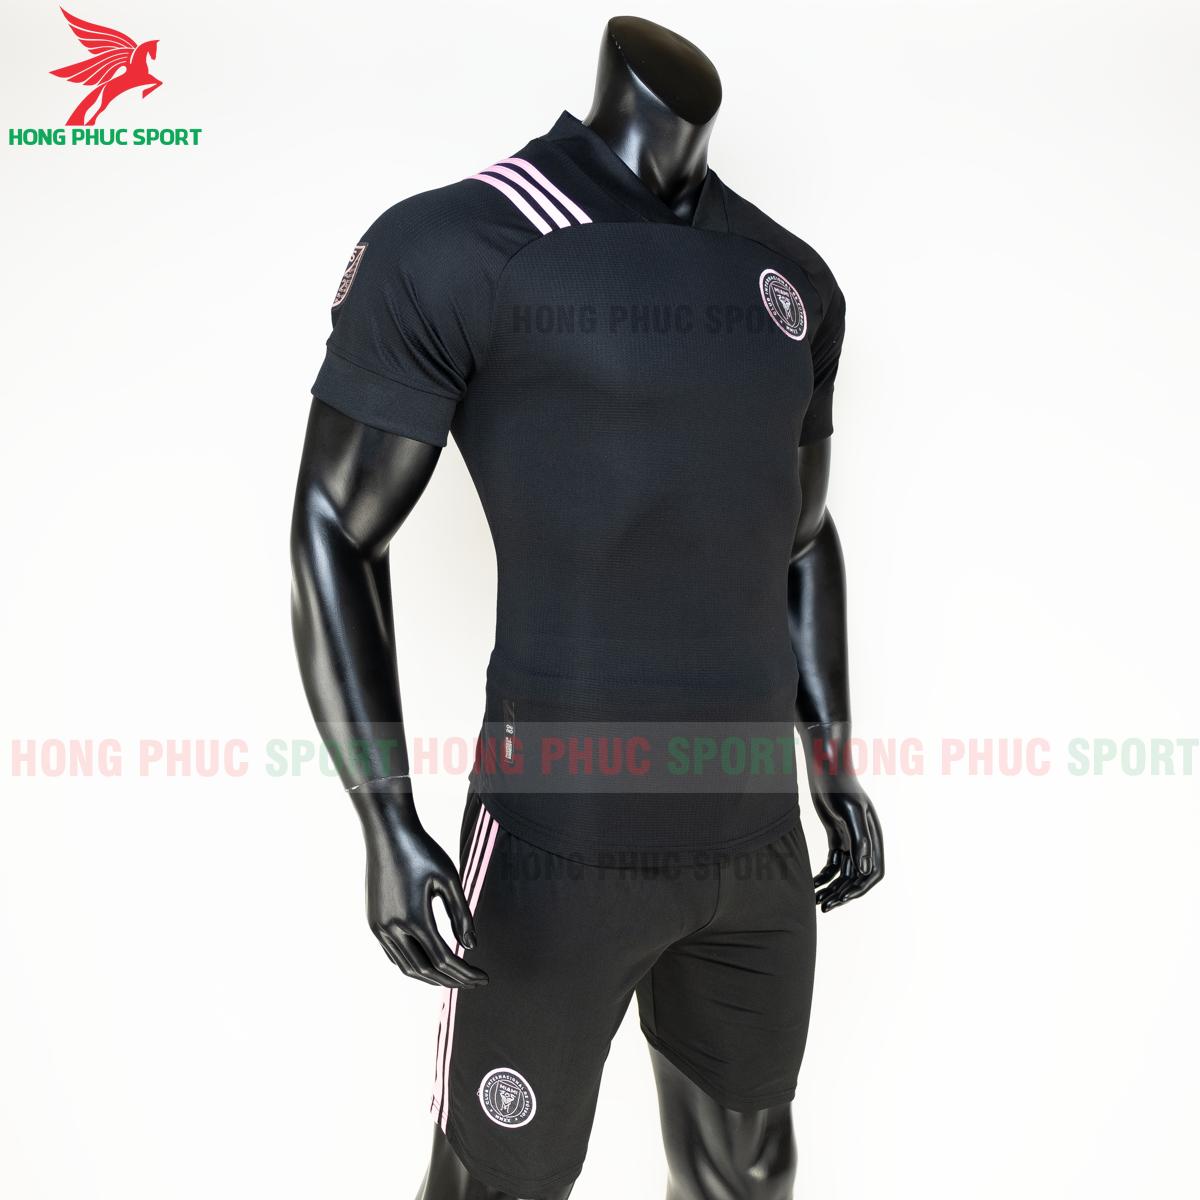 https://cdn.hongphucsport.com/unsafe/s4.shopbay.vn/files/285/ao-inter-miami-20-21-san-khach-hang-thailand-3-5fa0d29214e19.png